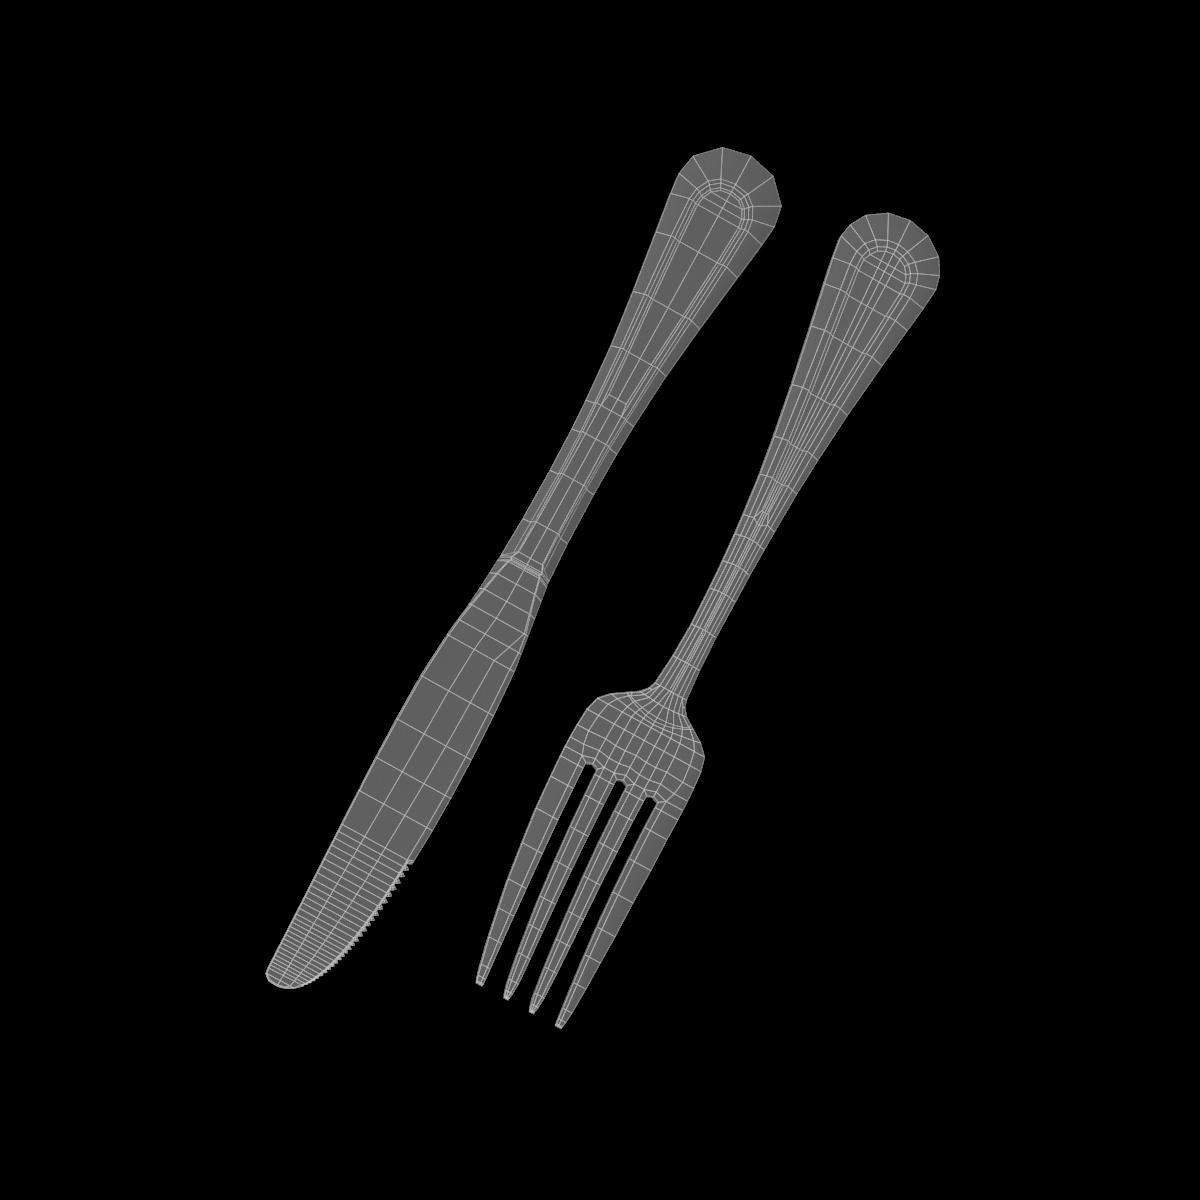 dessert knife and fork classic cutlery 3d model 3ds c4d fbx max max ma mb obj txt png stl 285932